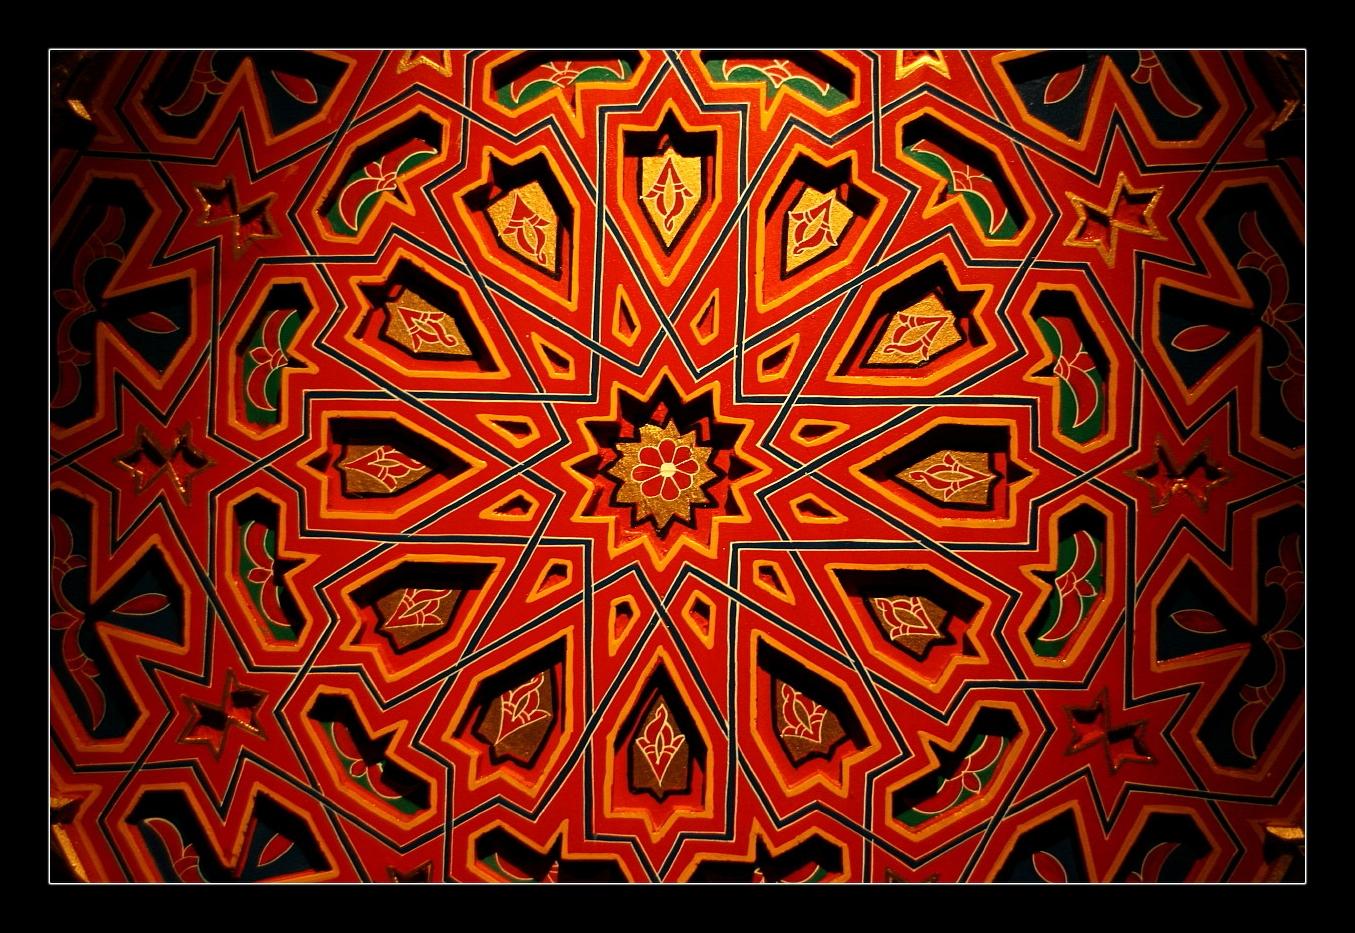 Orientalisch Foto & Bild   kunstfotografie & kultur, gemälde ...